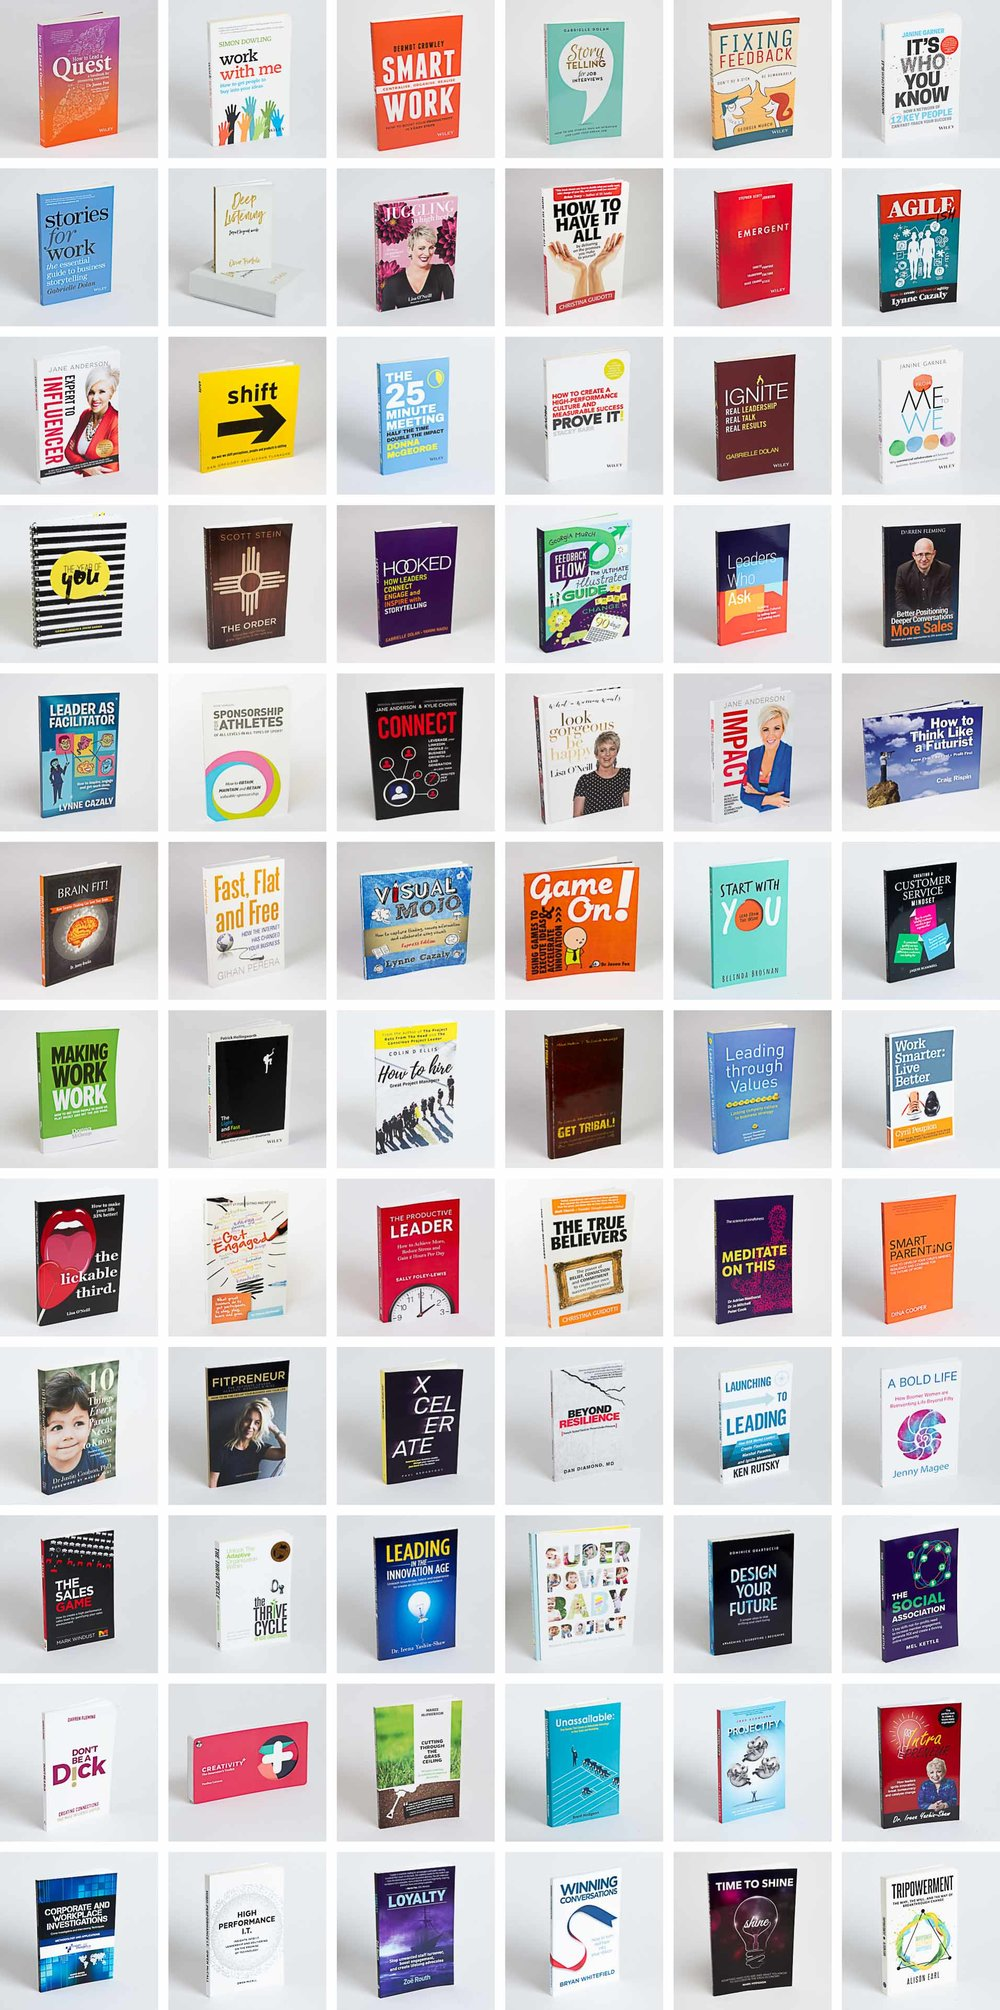 tlbs-books-1.jpg